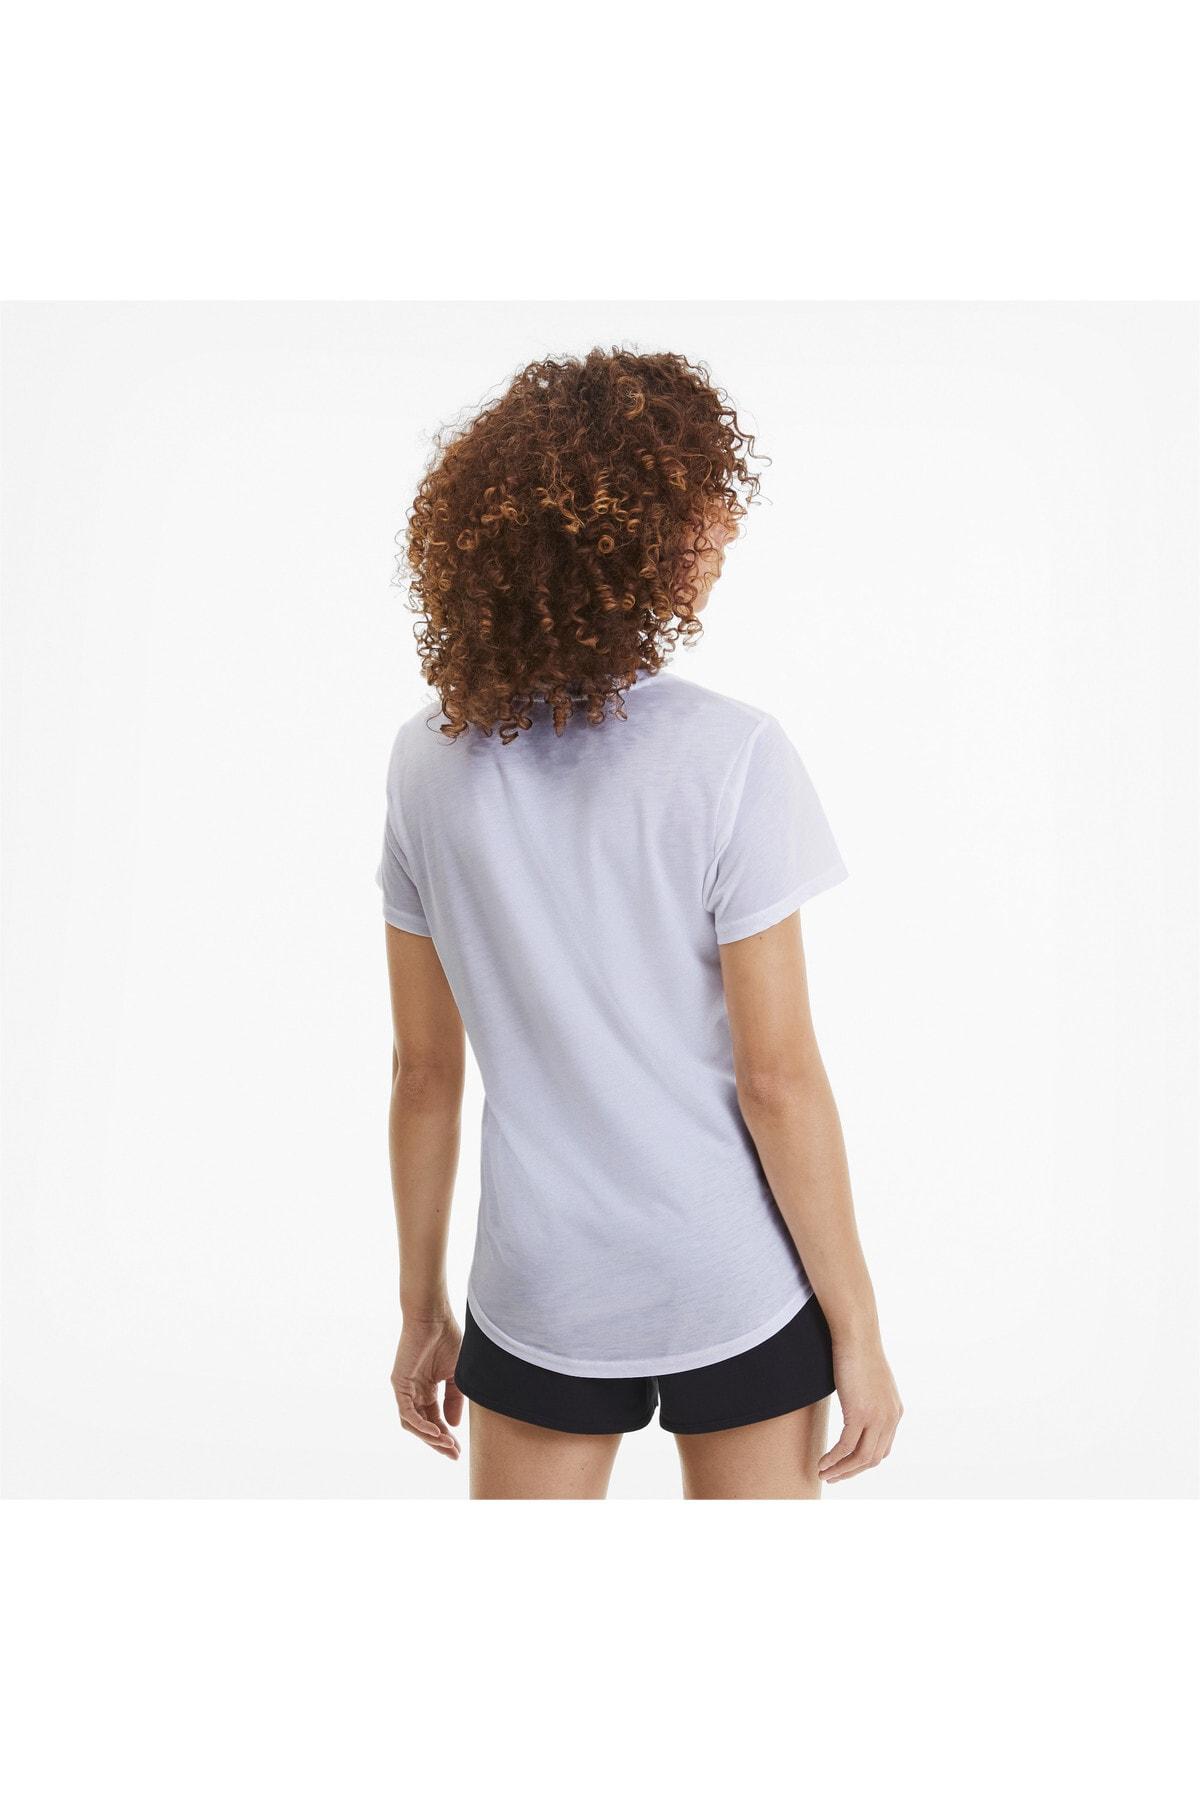 Puma Evostripe Kadın Tişört - 58124102 1